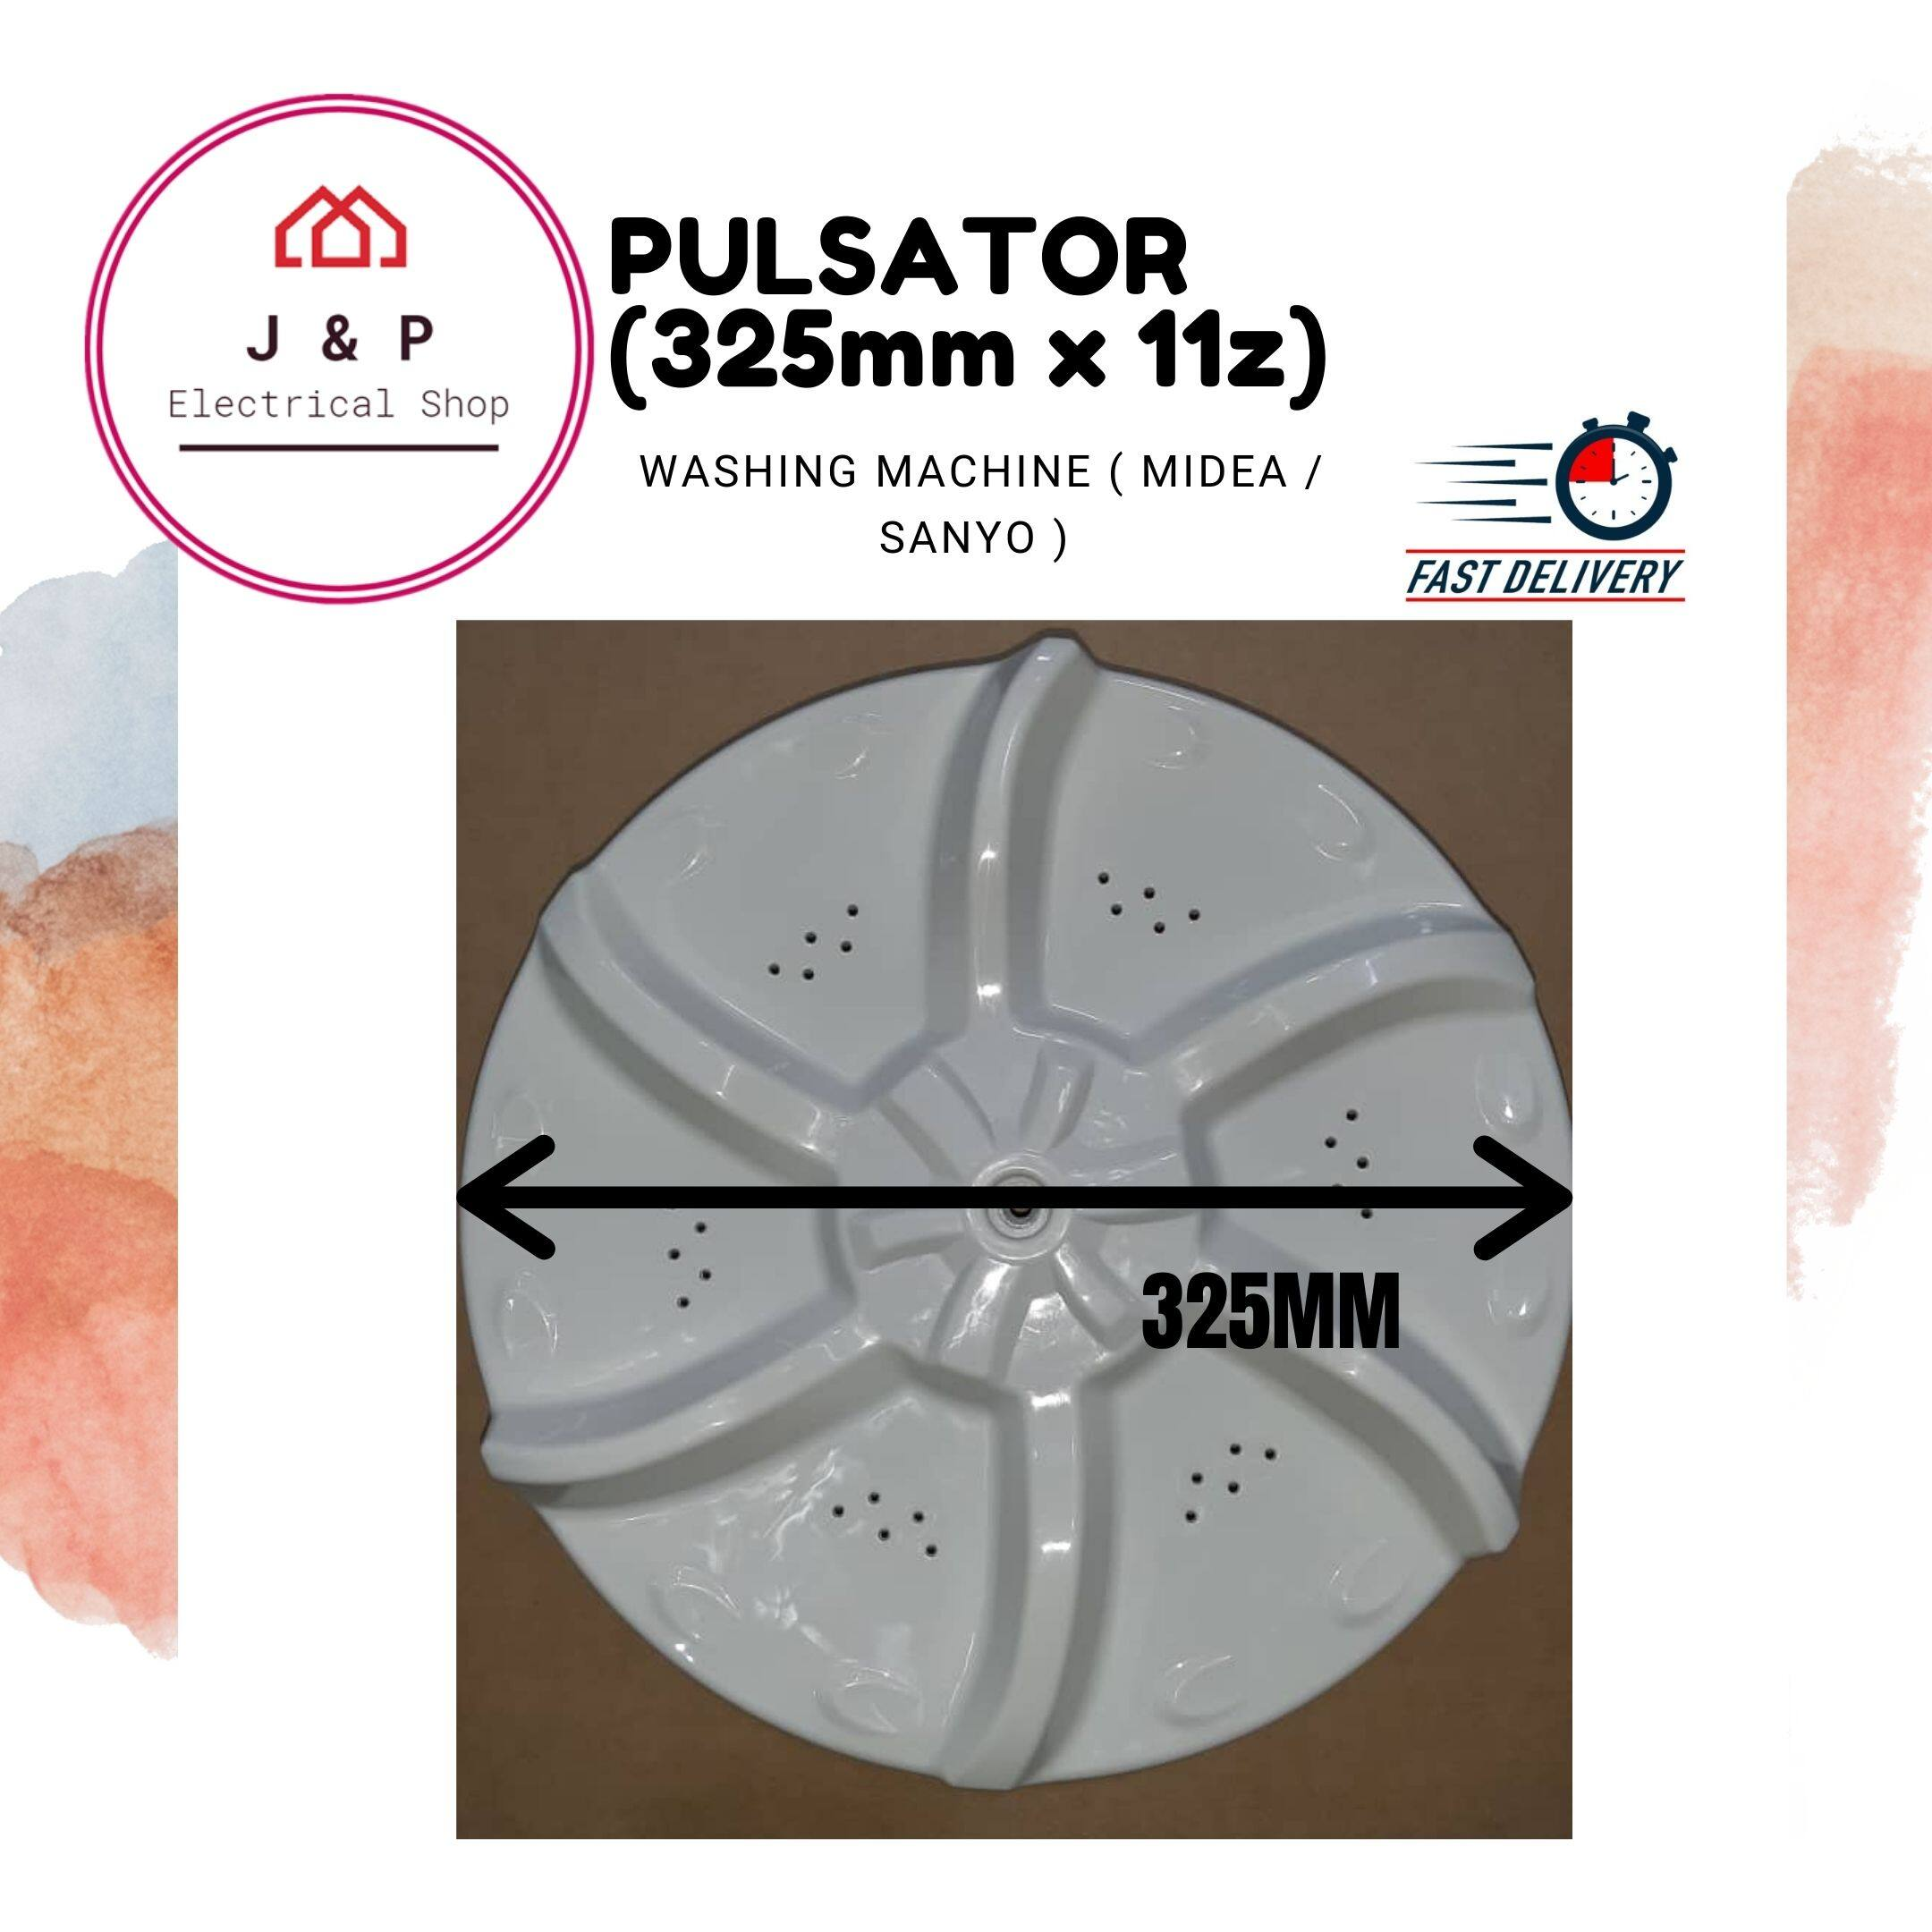 MIDEA / SANYO Pulsator for Washing Machine ( 325mm x 11z) [READY STOCK]1424610775-1599667585256-0